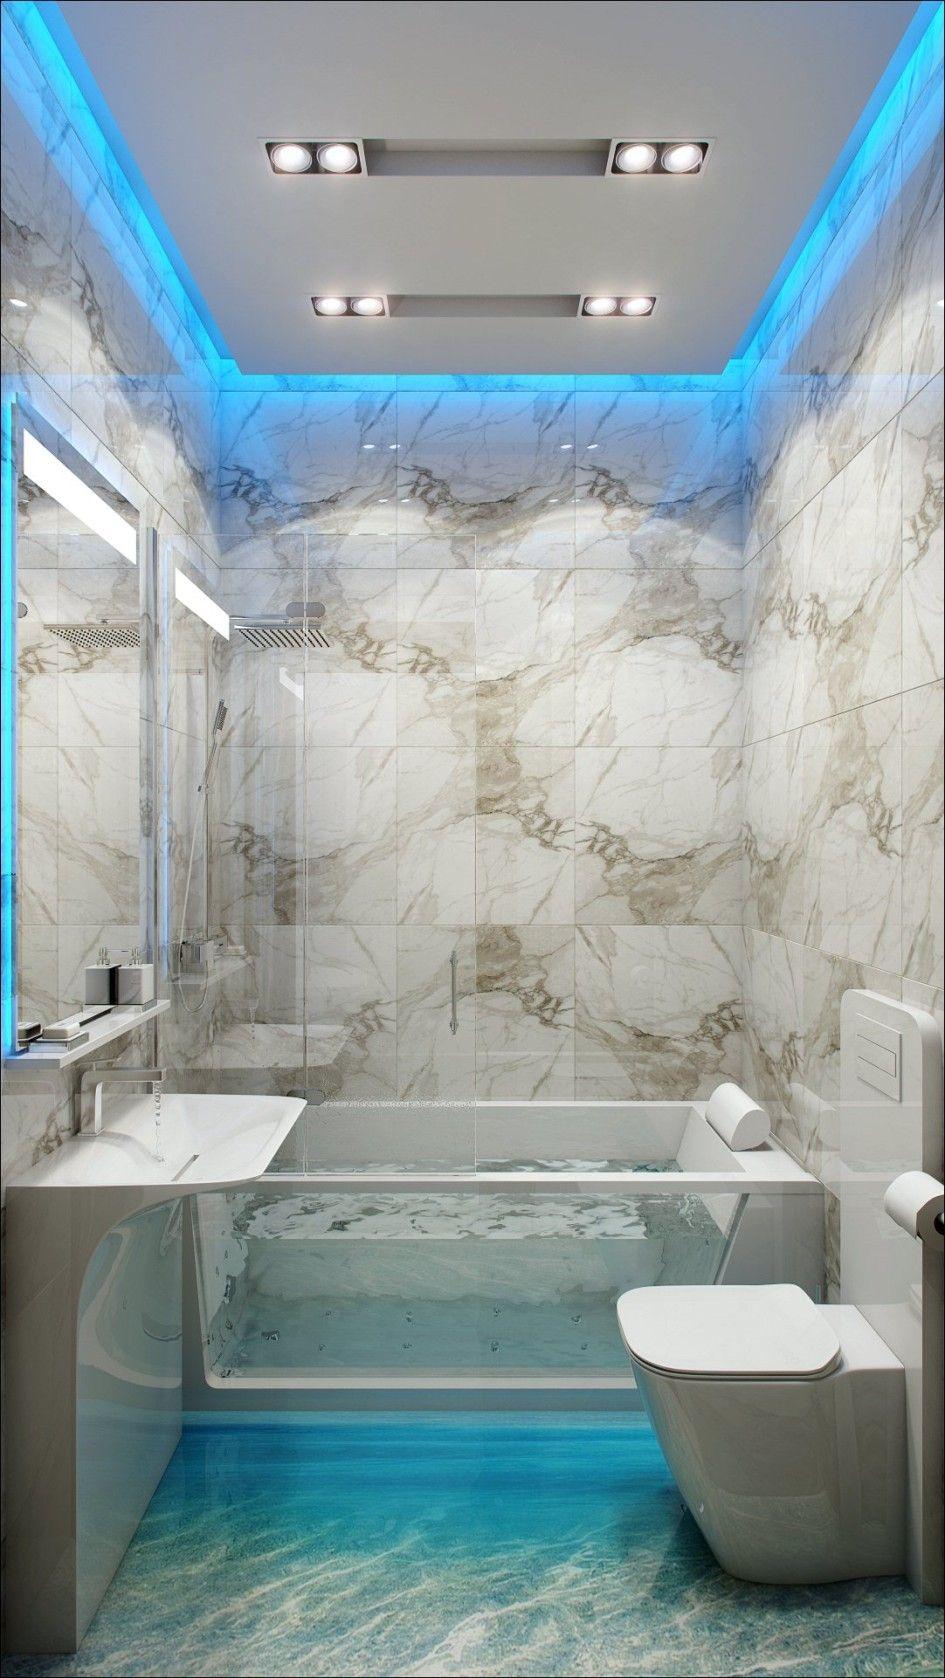 Bathroom, Astonishing Decoration Lighting System With Hidden Style ...